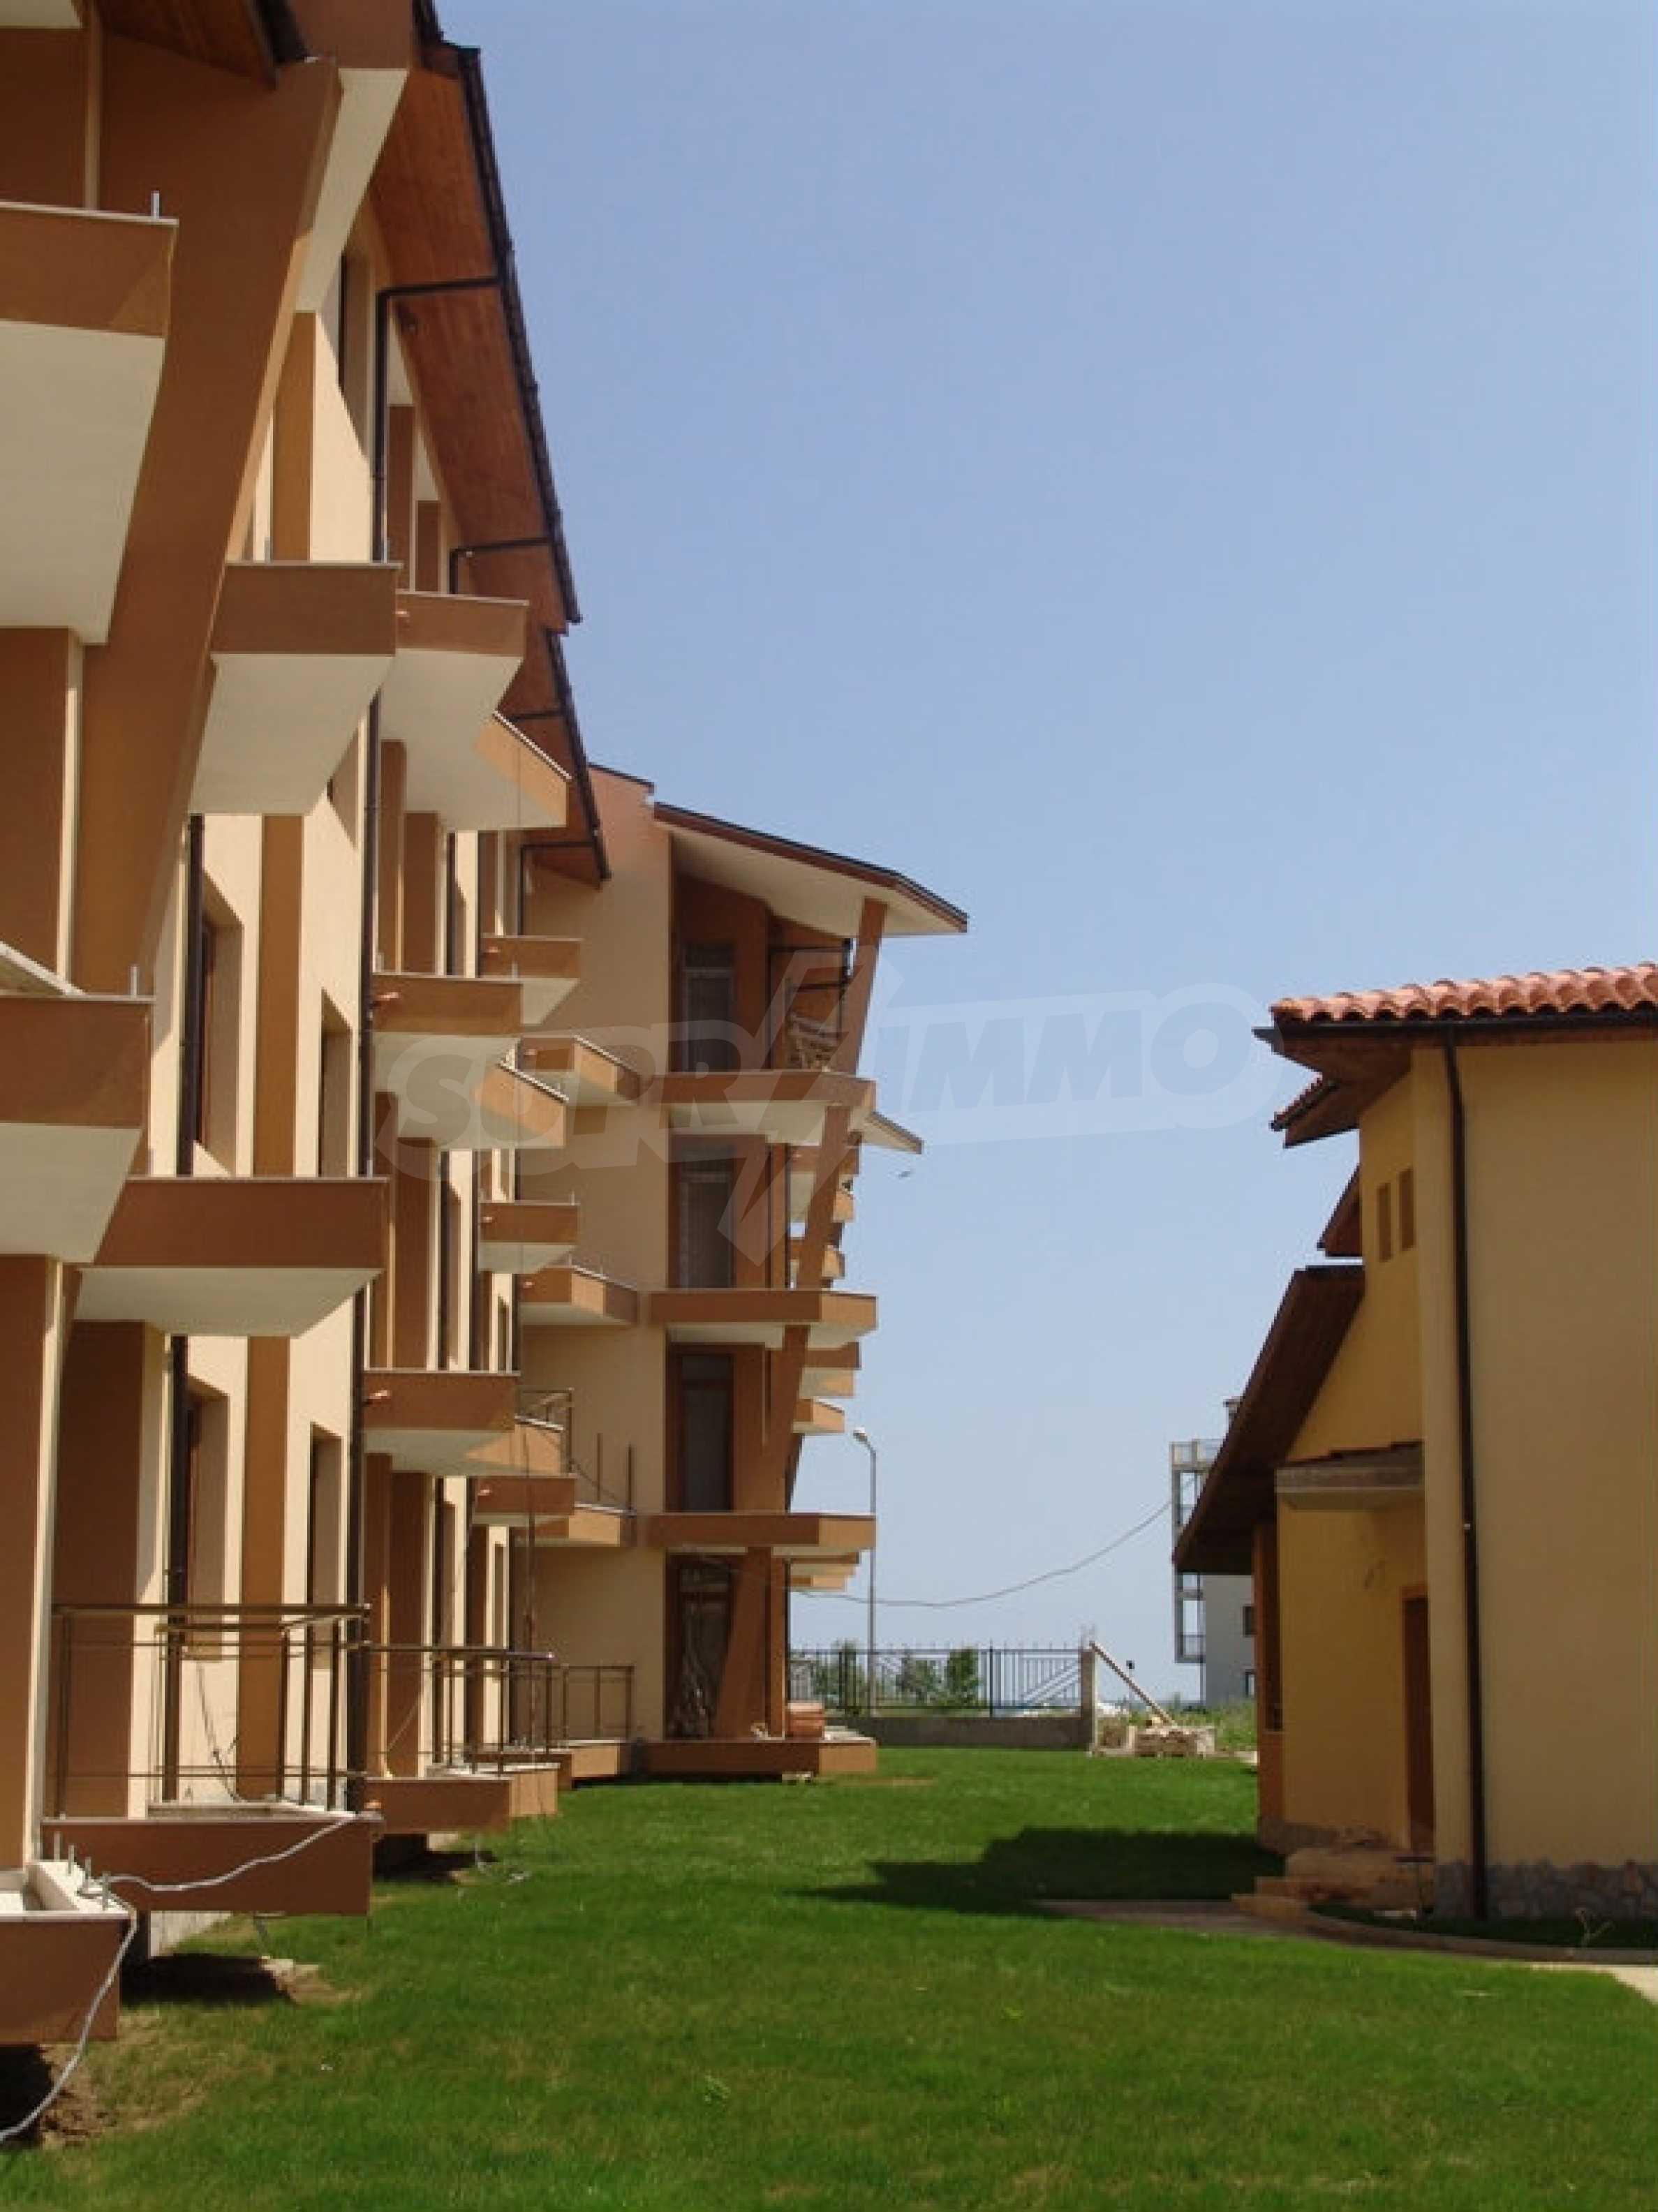 Studios und Apartments im Nestinarka-Komplex in Tsarevo 14